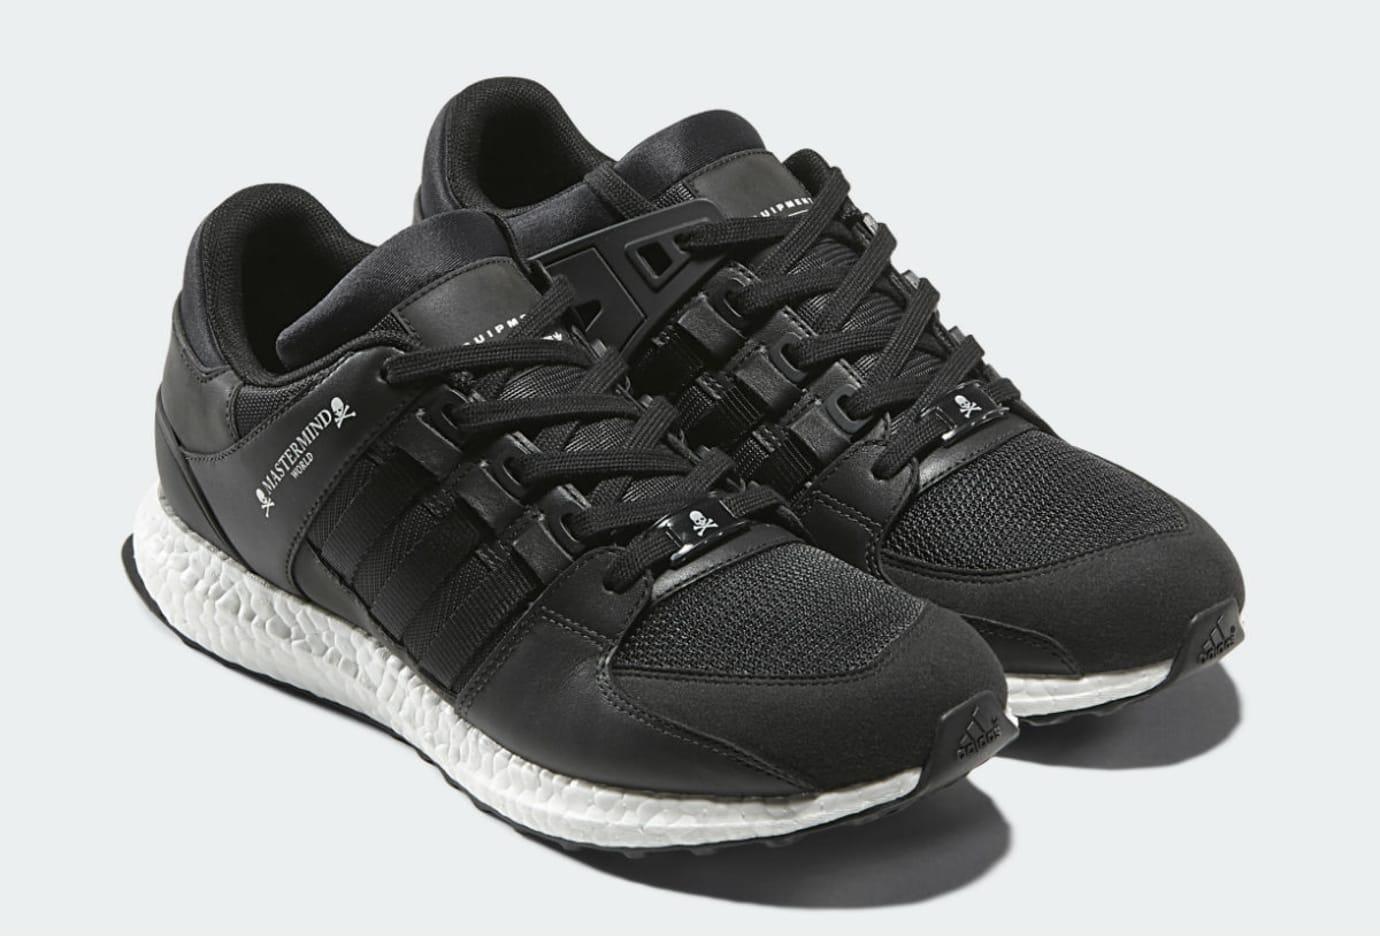 Mastermind x Adidas EQT Support Ultra Black Release Date